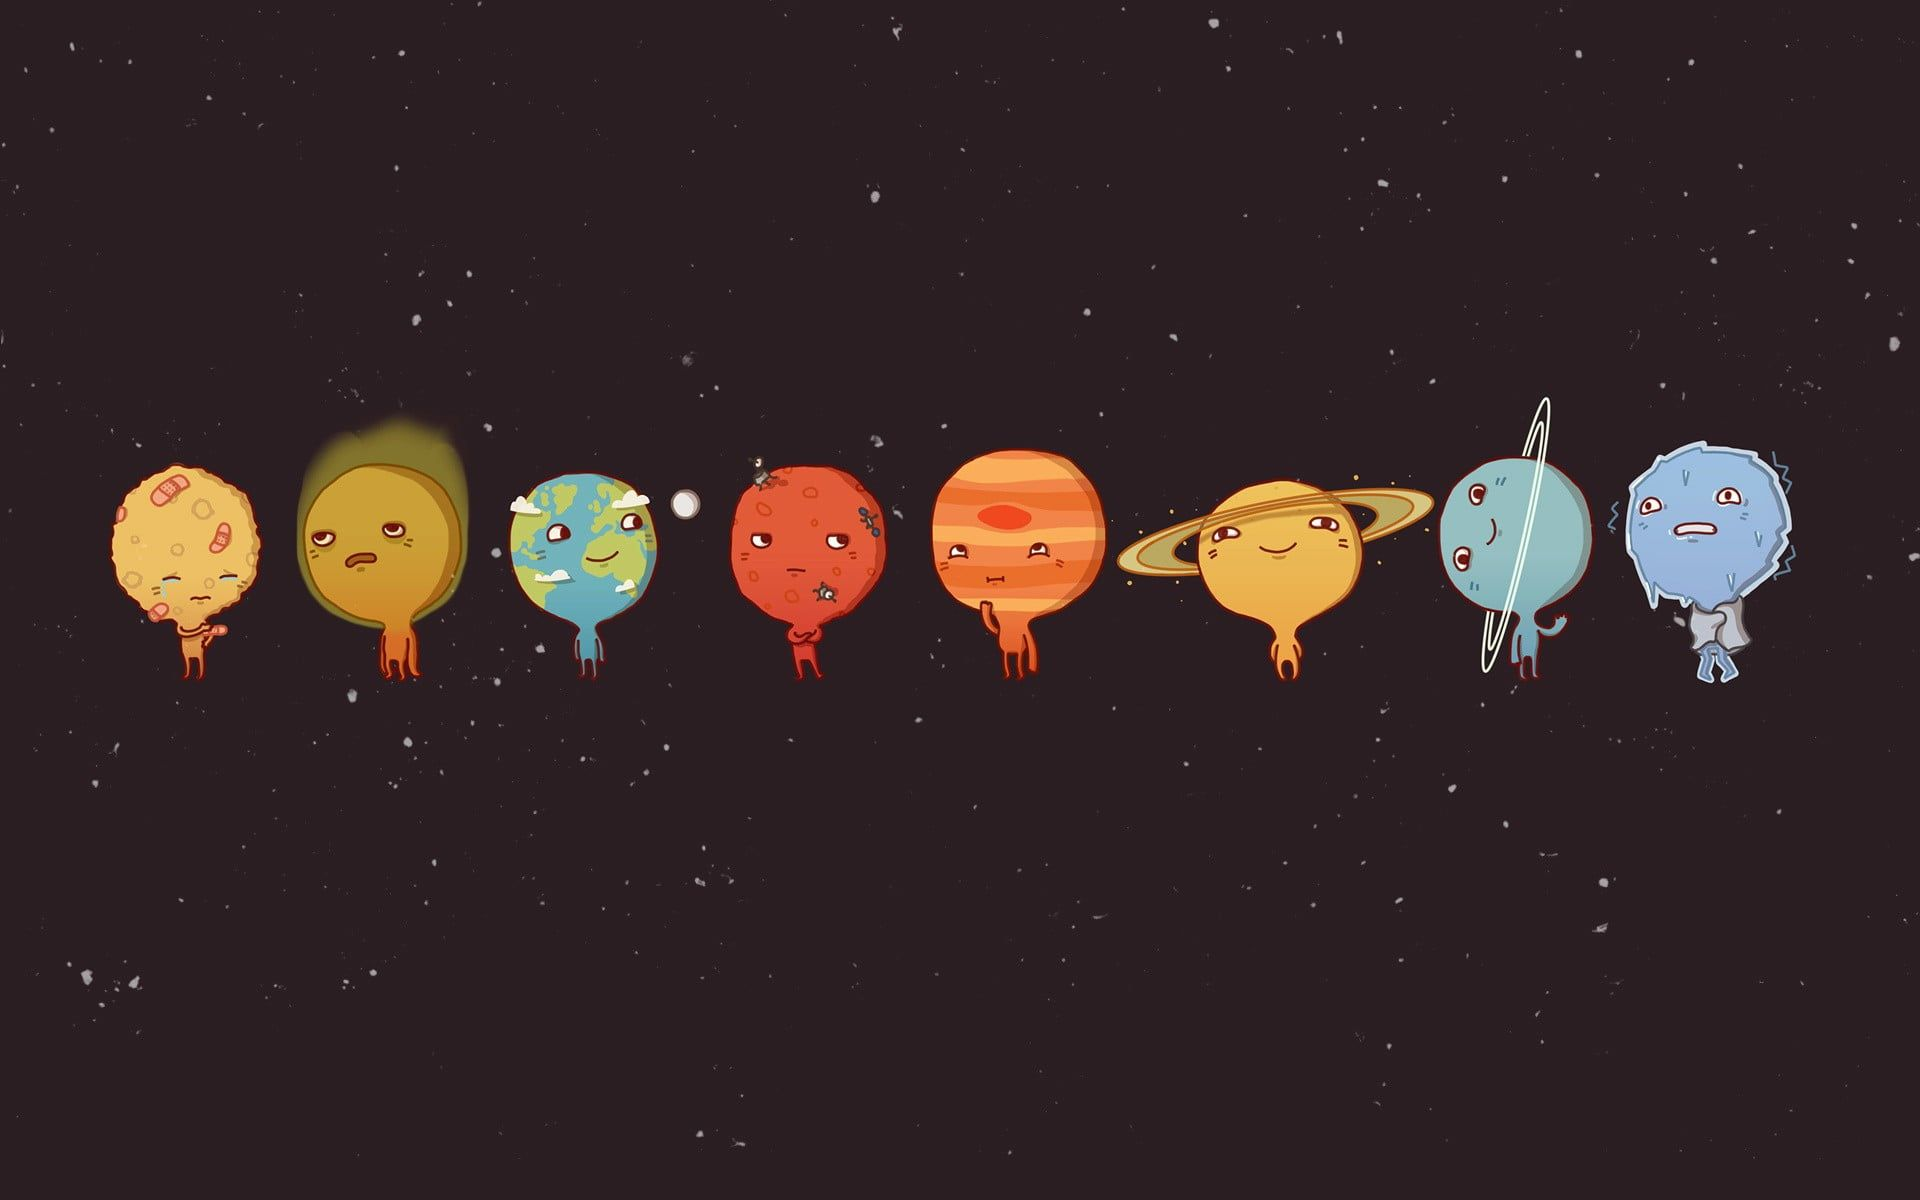 Solar System Cartoon Clip Art Universe Planet Emotion Minimalism Solar System Humor S Cute Wallpapers For Computer Desktop Wallpapers Tumblr Wallpaper Pc